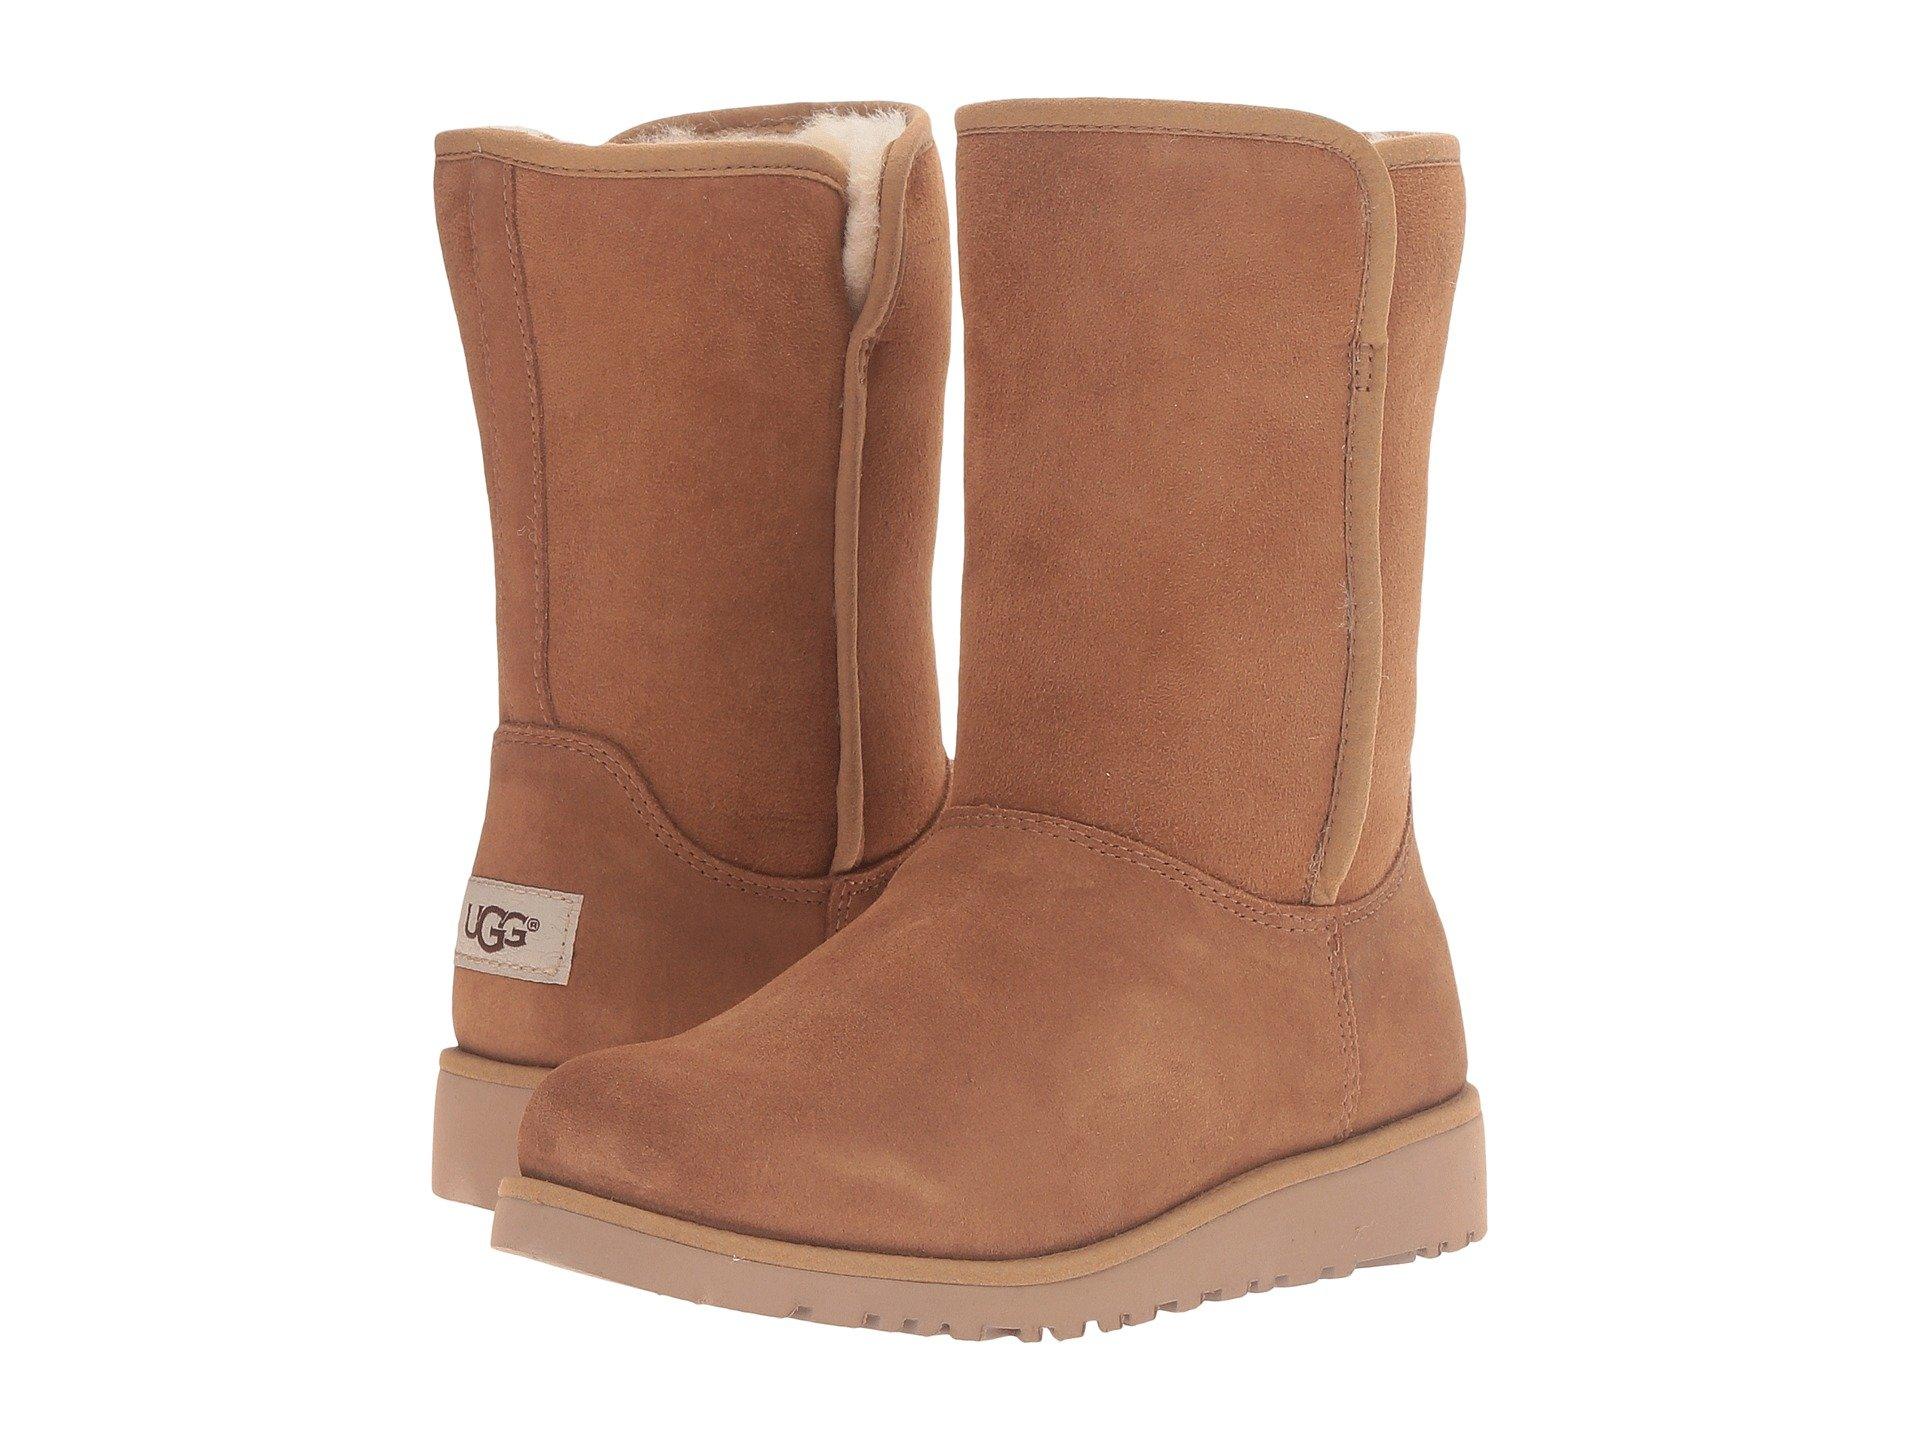 UGG Kids Alexey (Little Kid/Big Kid) (Chestnut) Girls Shoes